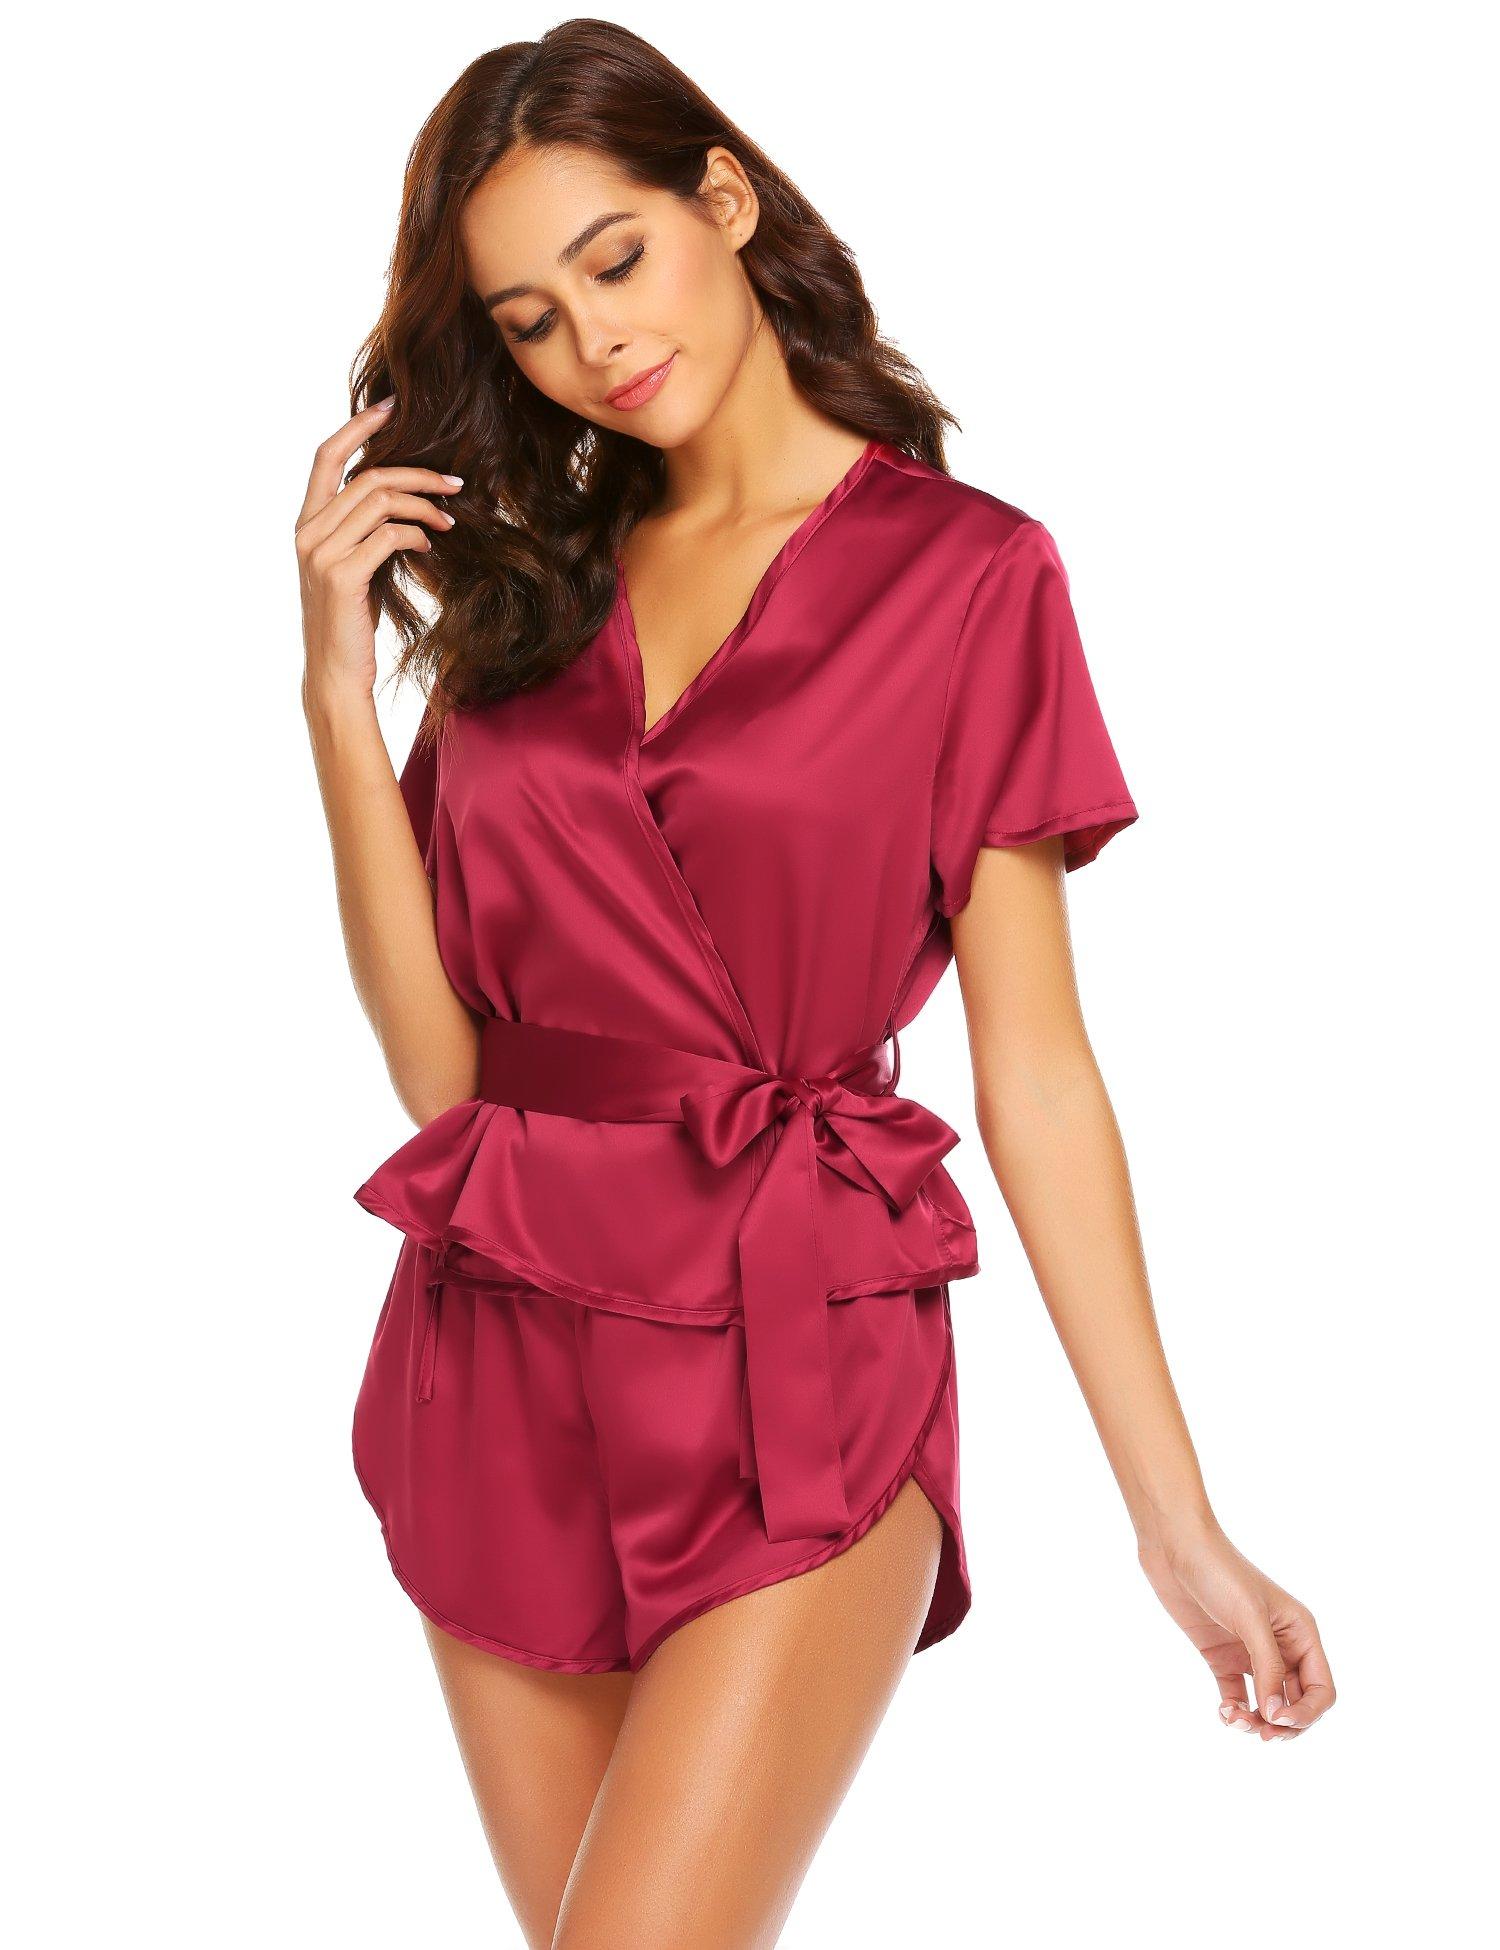 Pintimi Sexy Sleepwear for Women Kimono Short Set Dark Red L